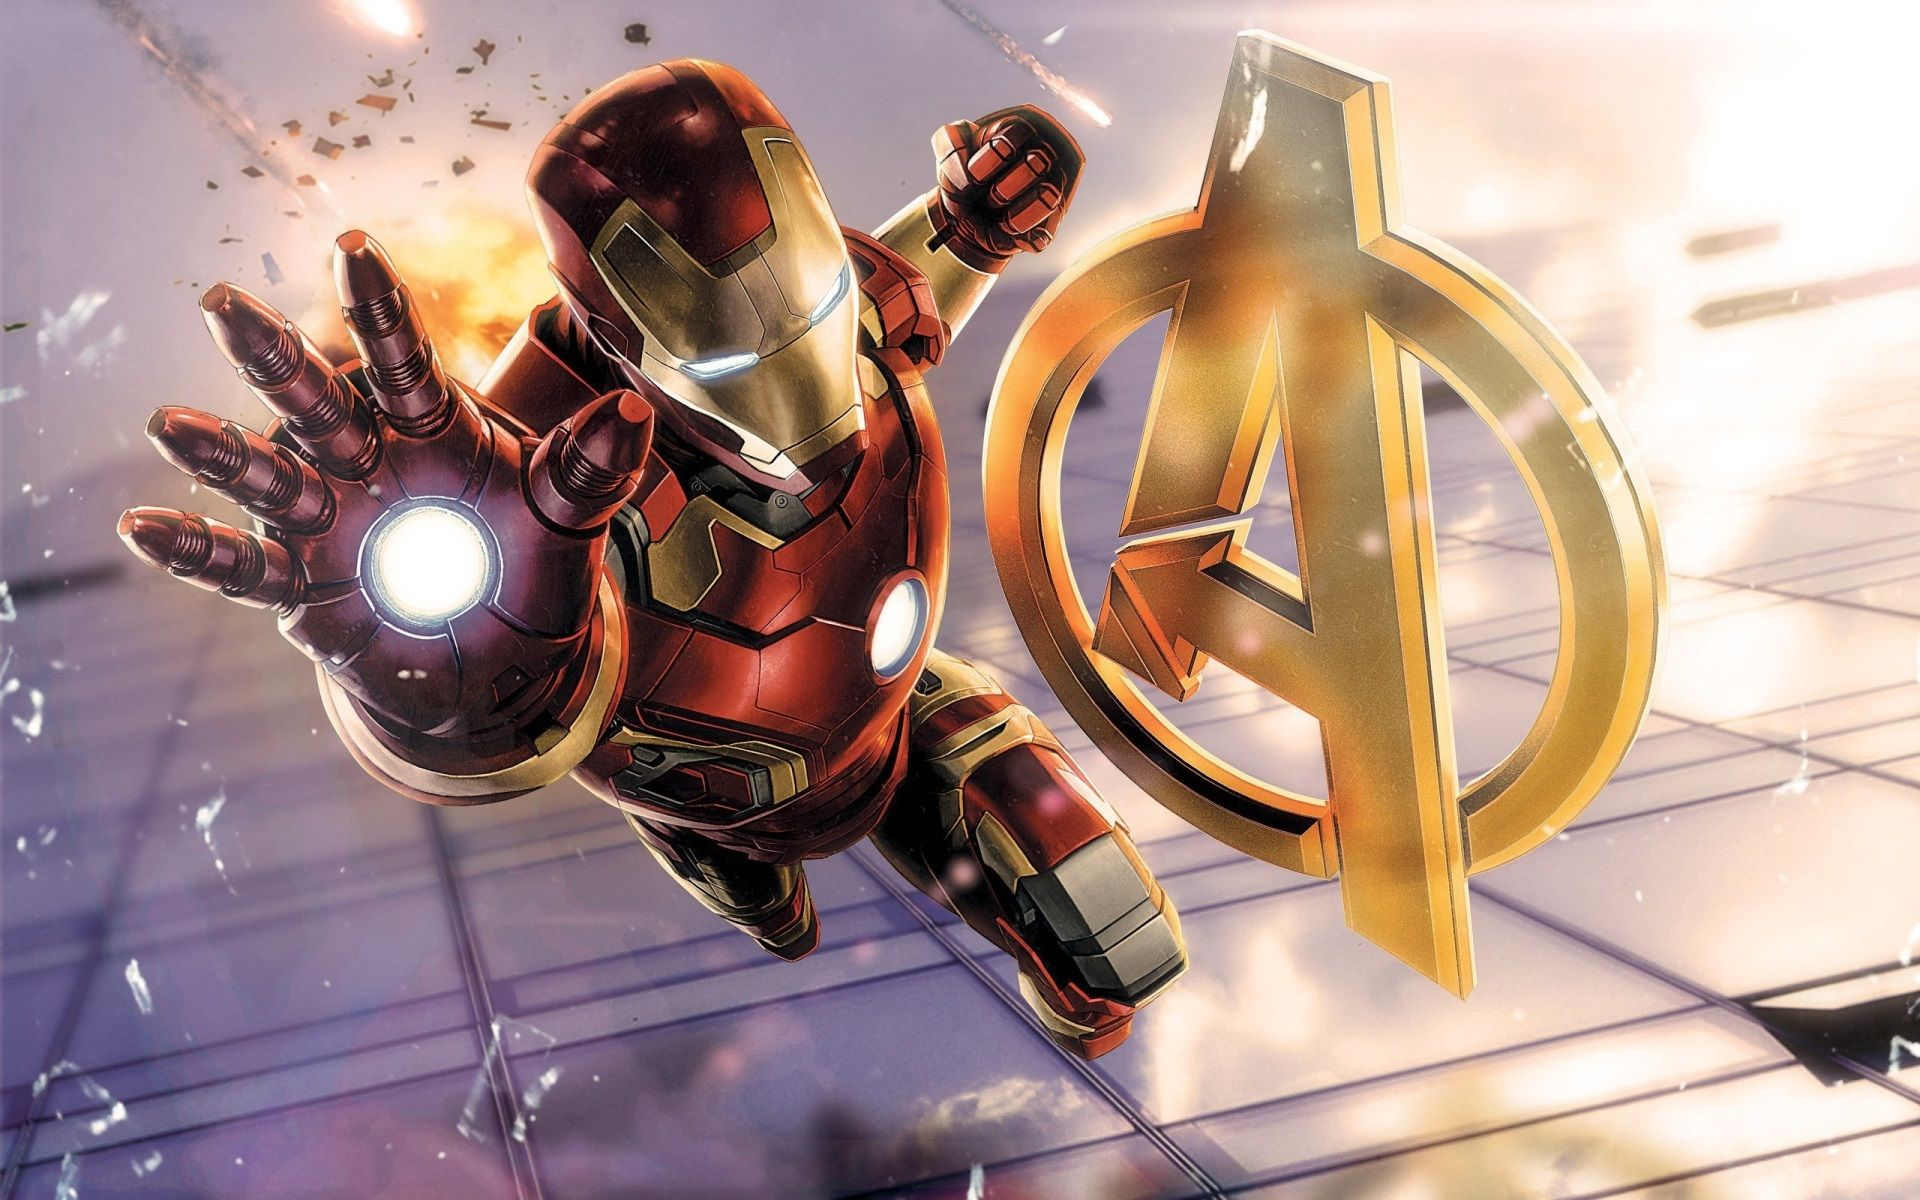 19x10 Avengers Pc Hd Wallpaper Download Iron Man Avengers Iron Man Movie Avengers